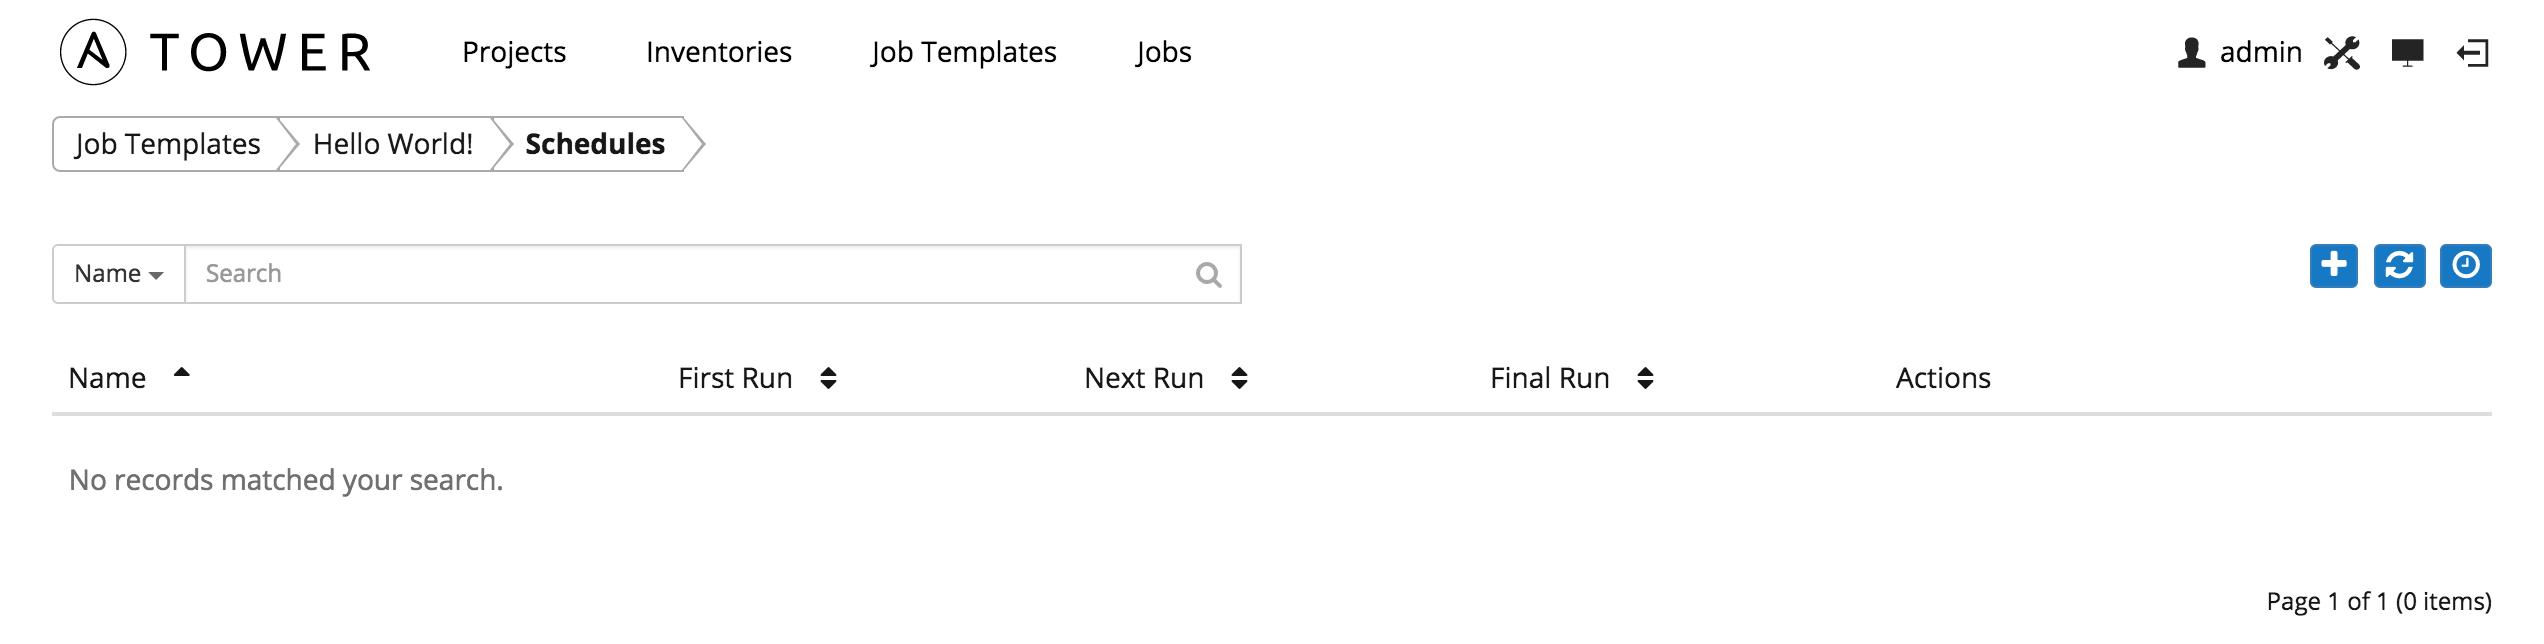 Job Templates   Schedule Launch  Job Manual Template